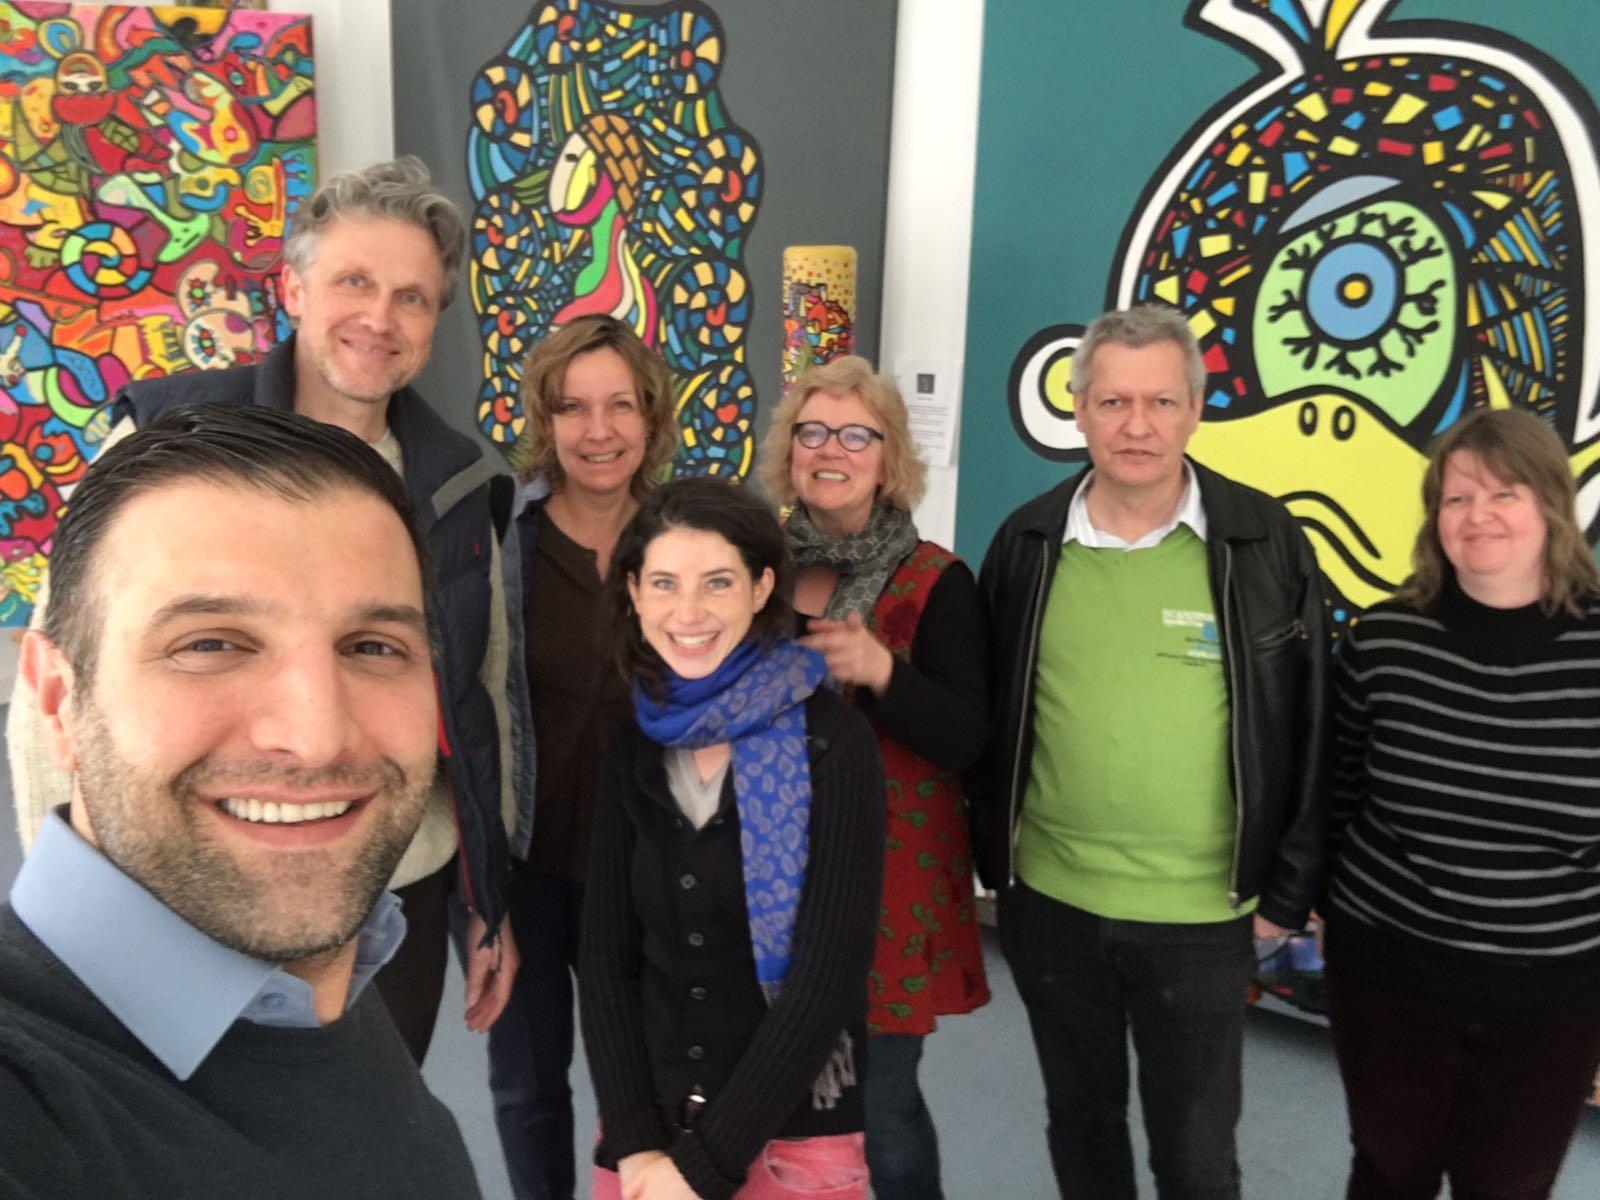 Lebendiger Kunst-Treffpunkt: Besuch im Café Osbili